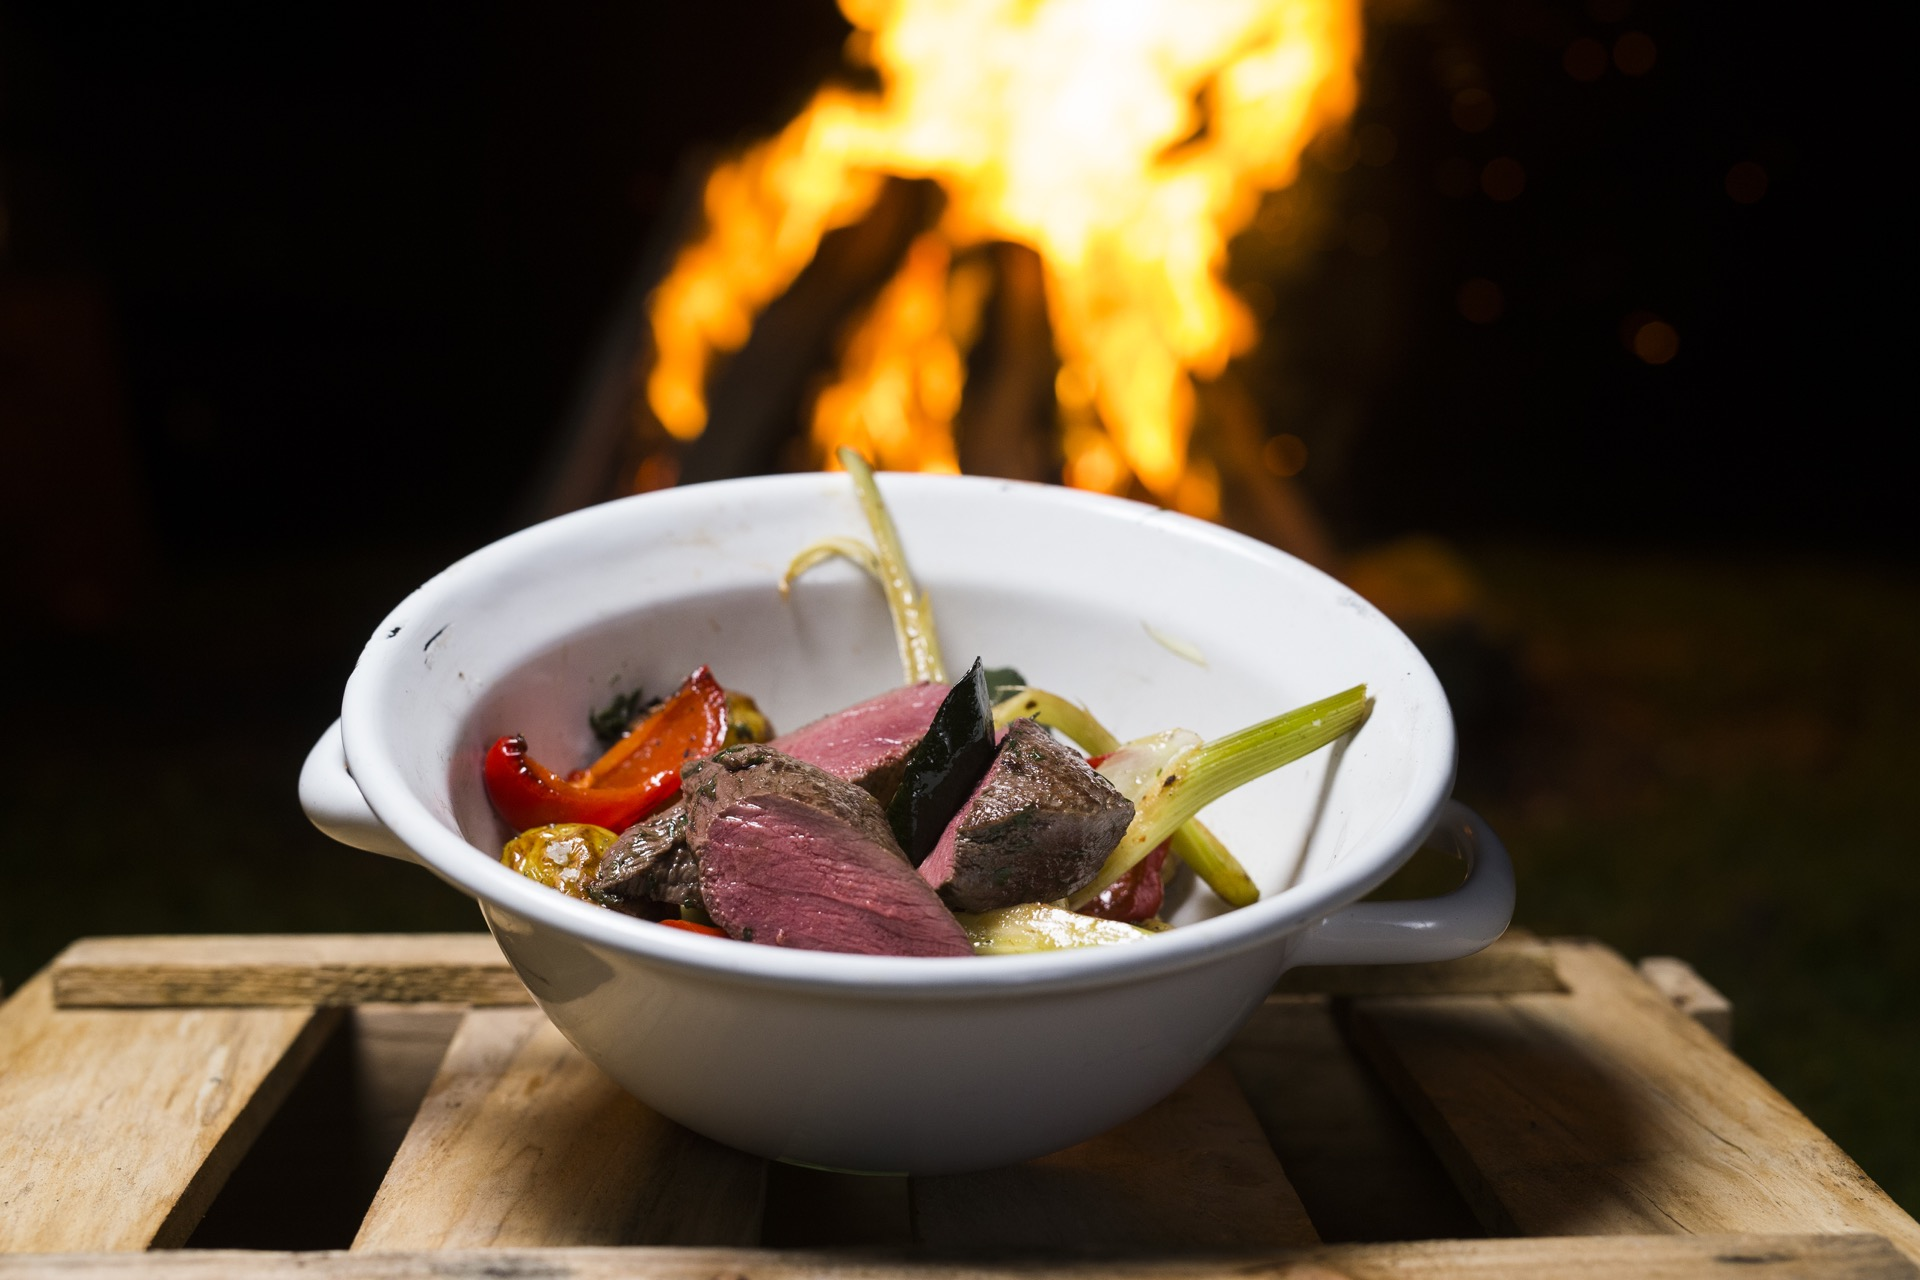 Fertig! So lecker kann Grillen sein! ©Oliver Hardtjaegermagazin jagd campers kitchen kochen köche